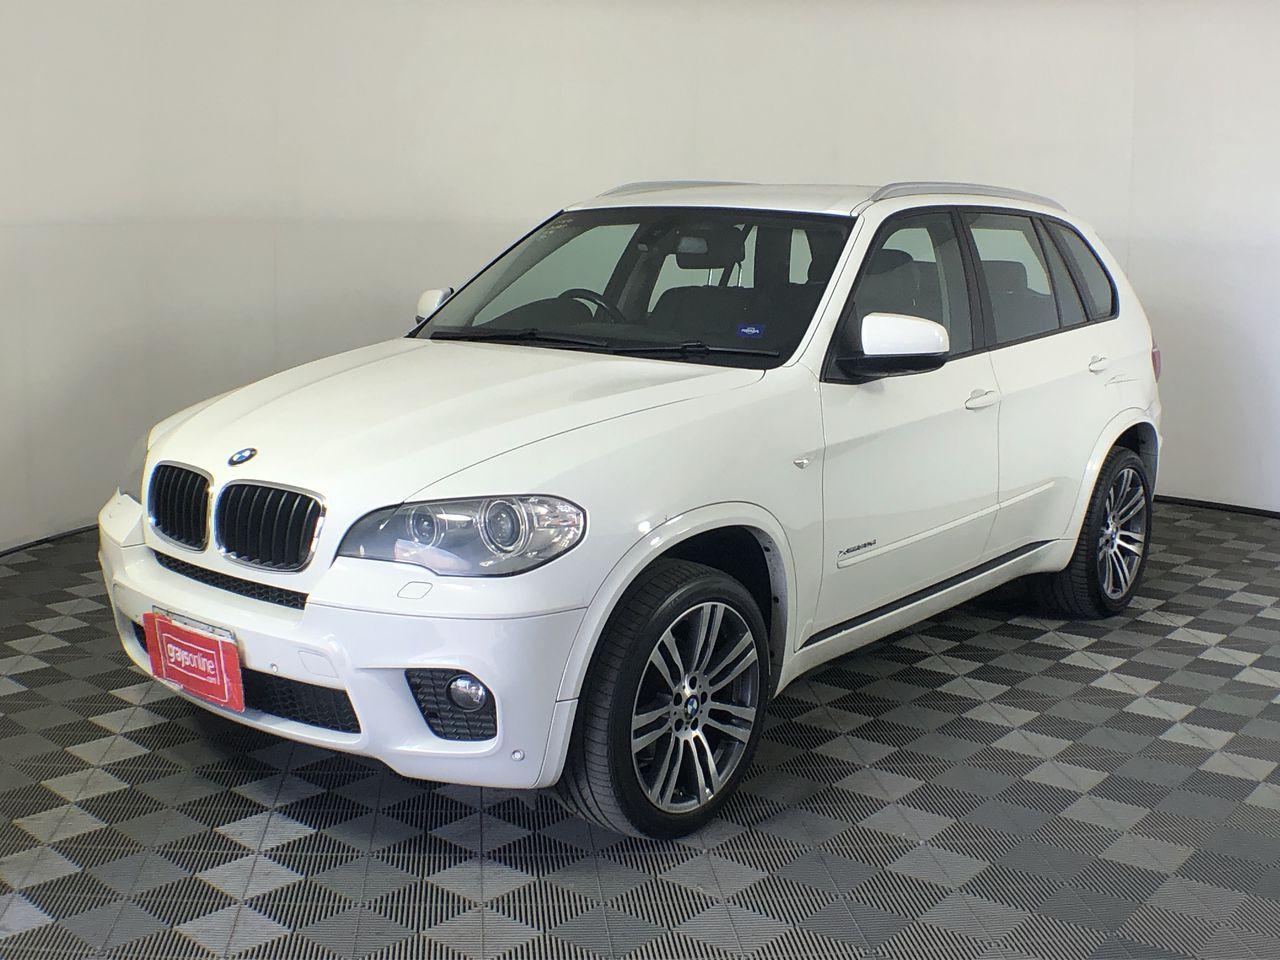 2013 BMW X5 xDrive 30d E70 LCI Turbo Diesel Automatic - 8 Speed Wagon